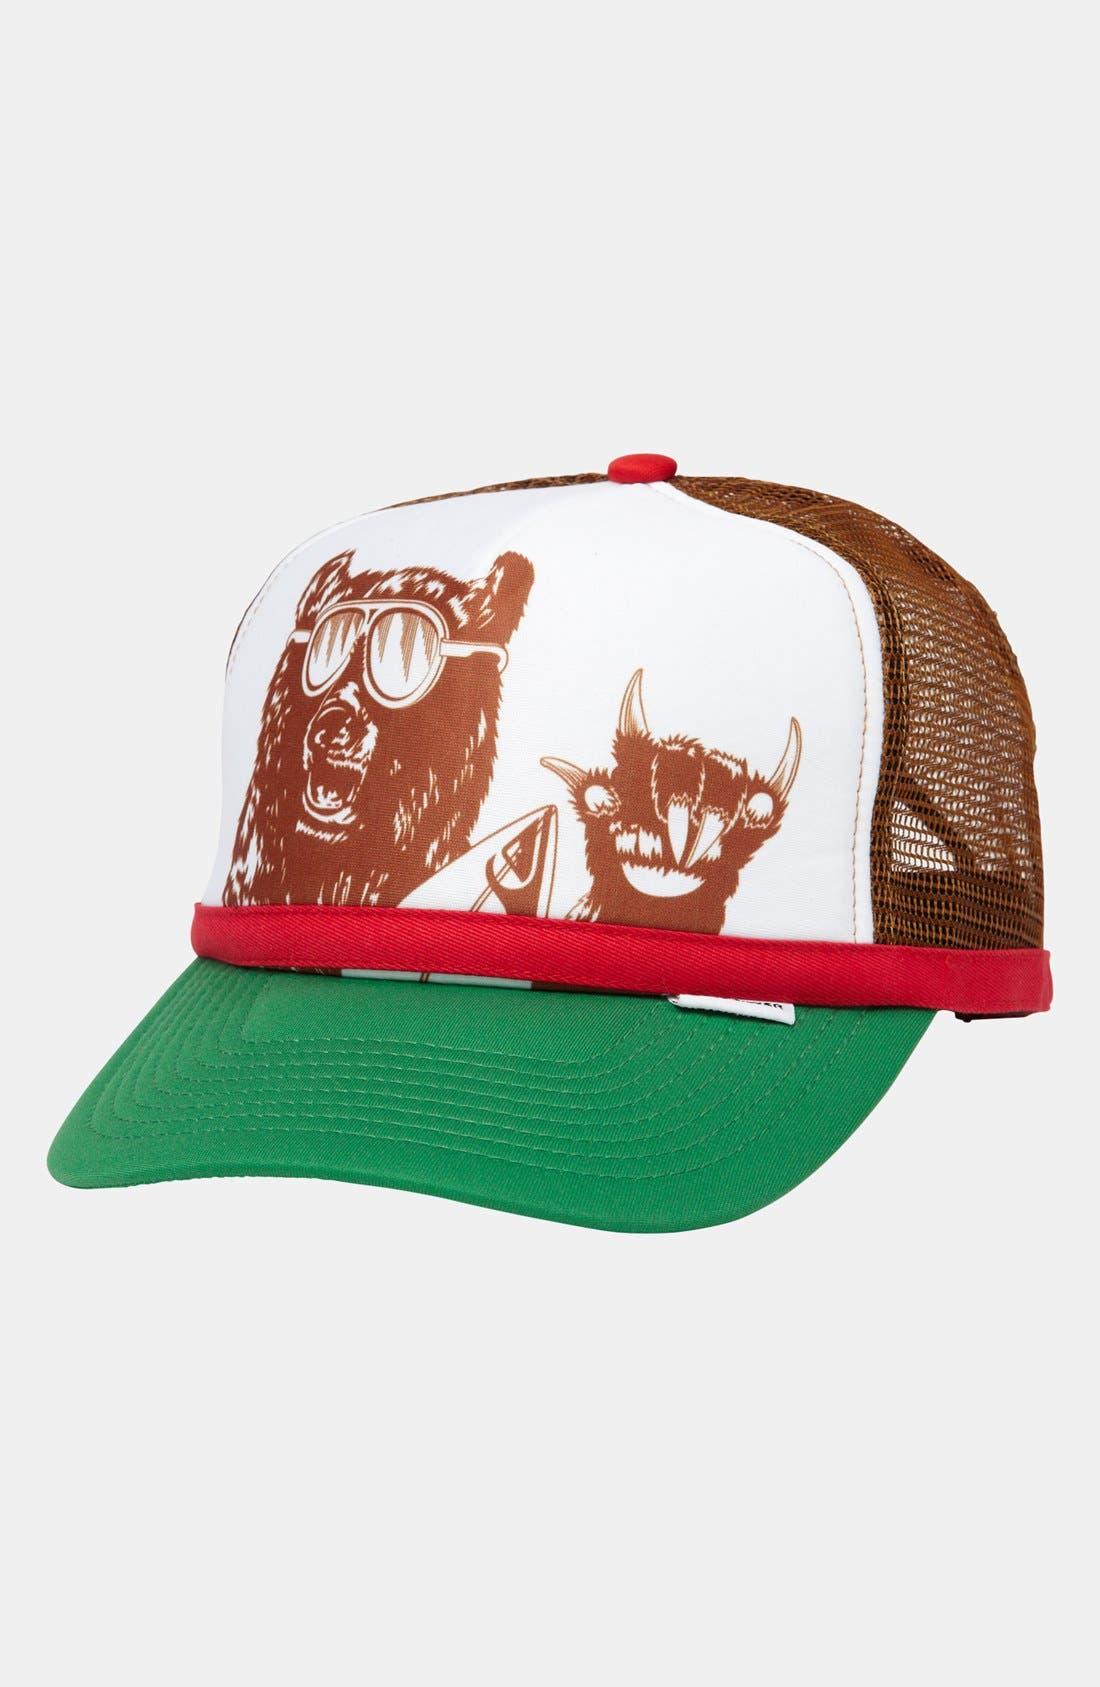 Alternate Image 1 Selected - Quiksilver 'Terg Ferg' Trucker Hat (Boys)